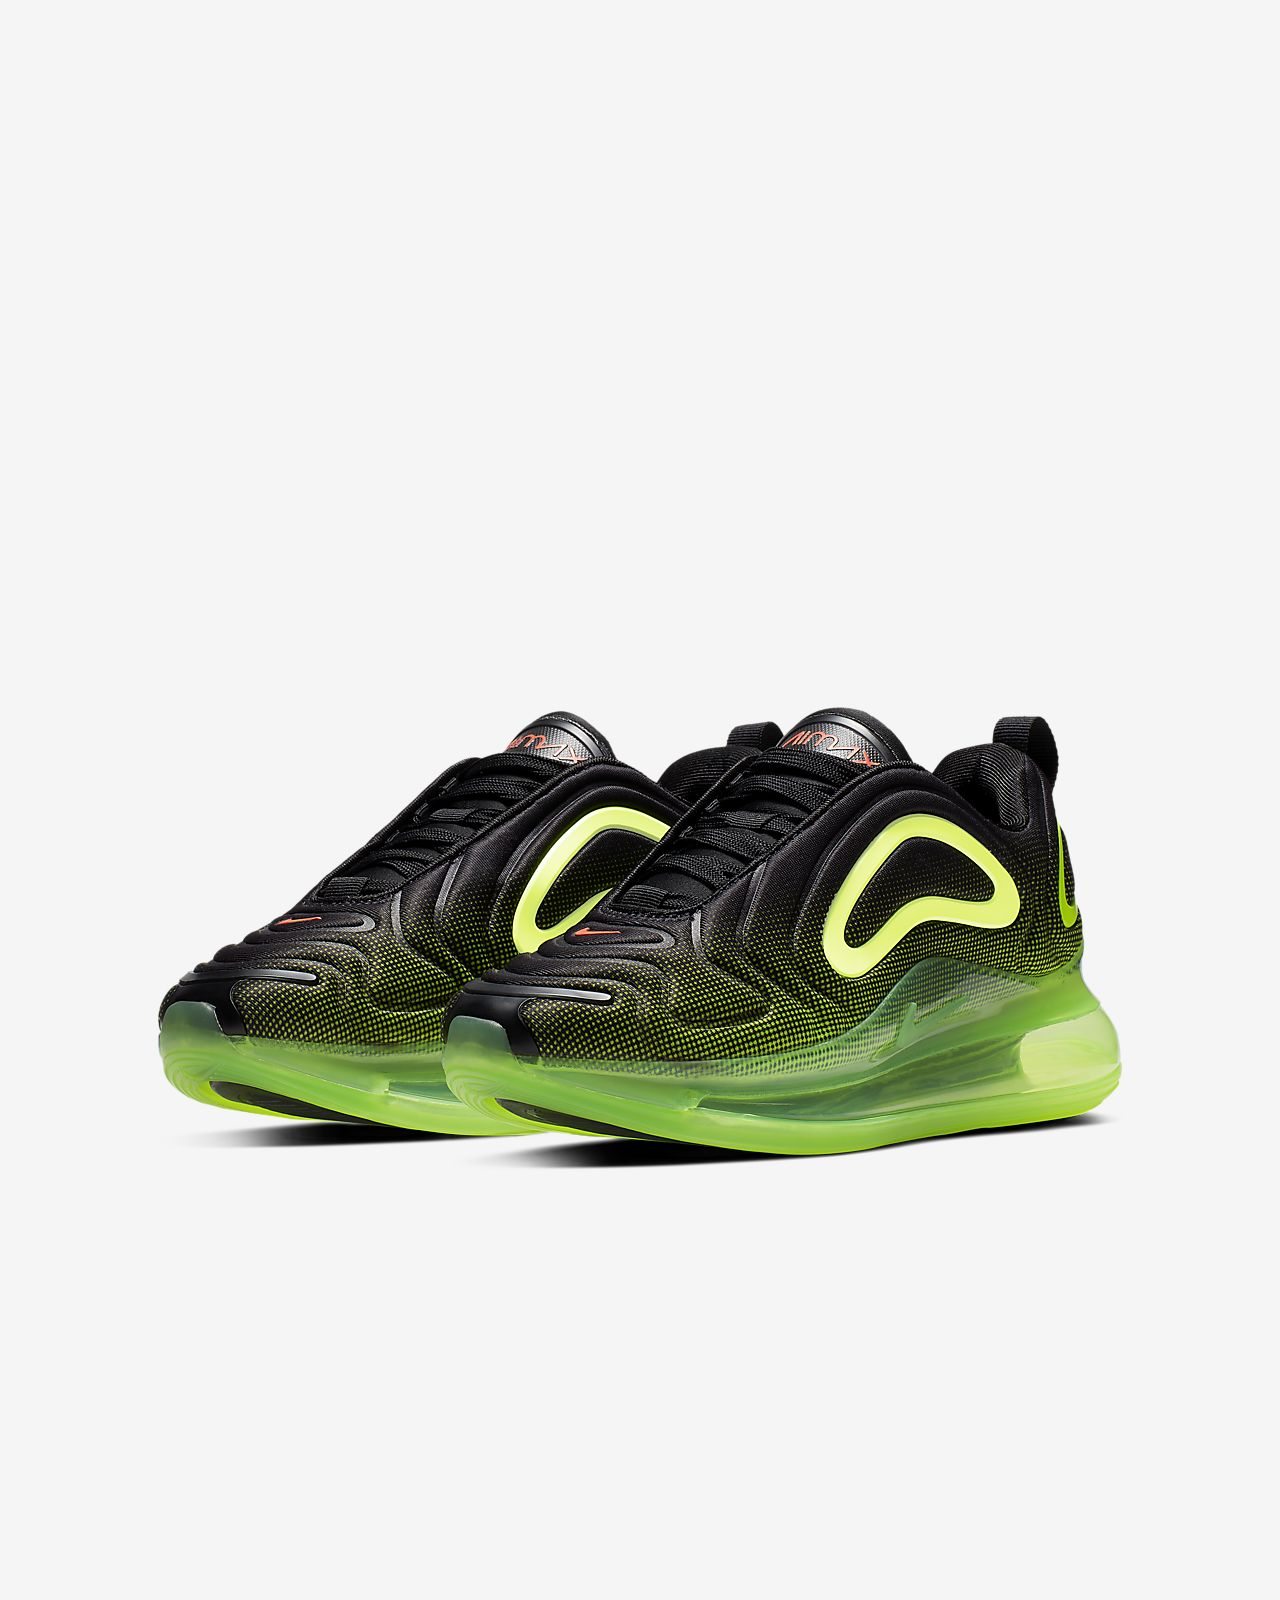 Nike Air Max 720 Schuh Für Jüngere ältere Kinder